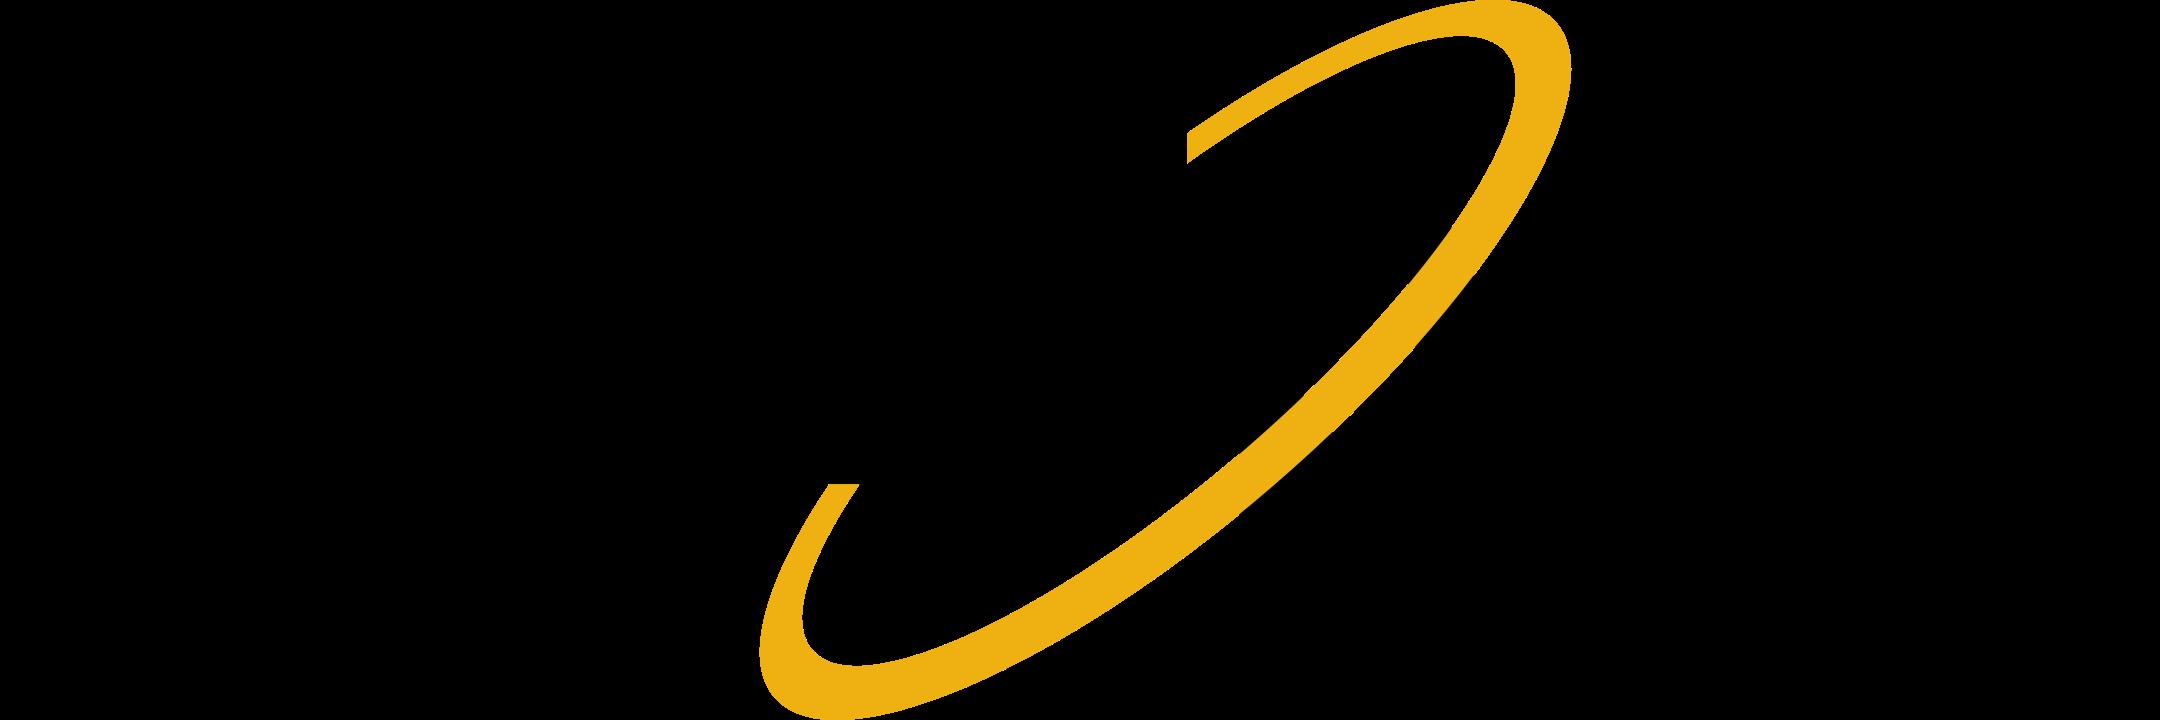 whirlpool logo 1 - Whirlpool Logo